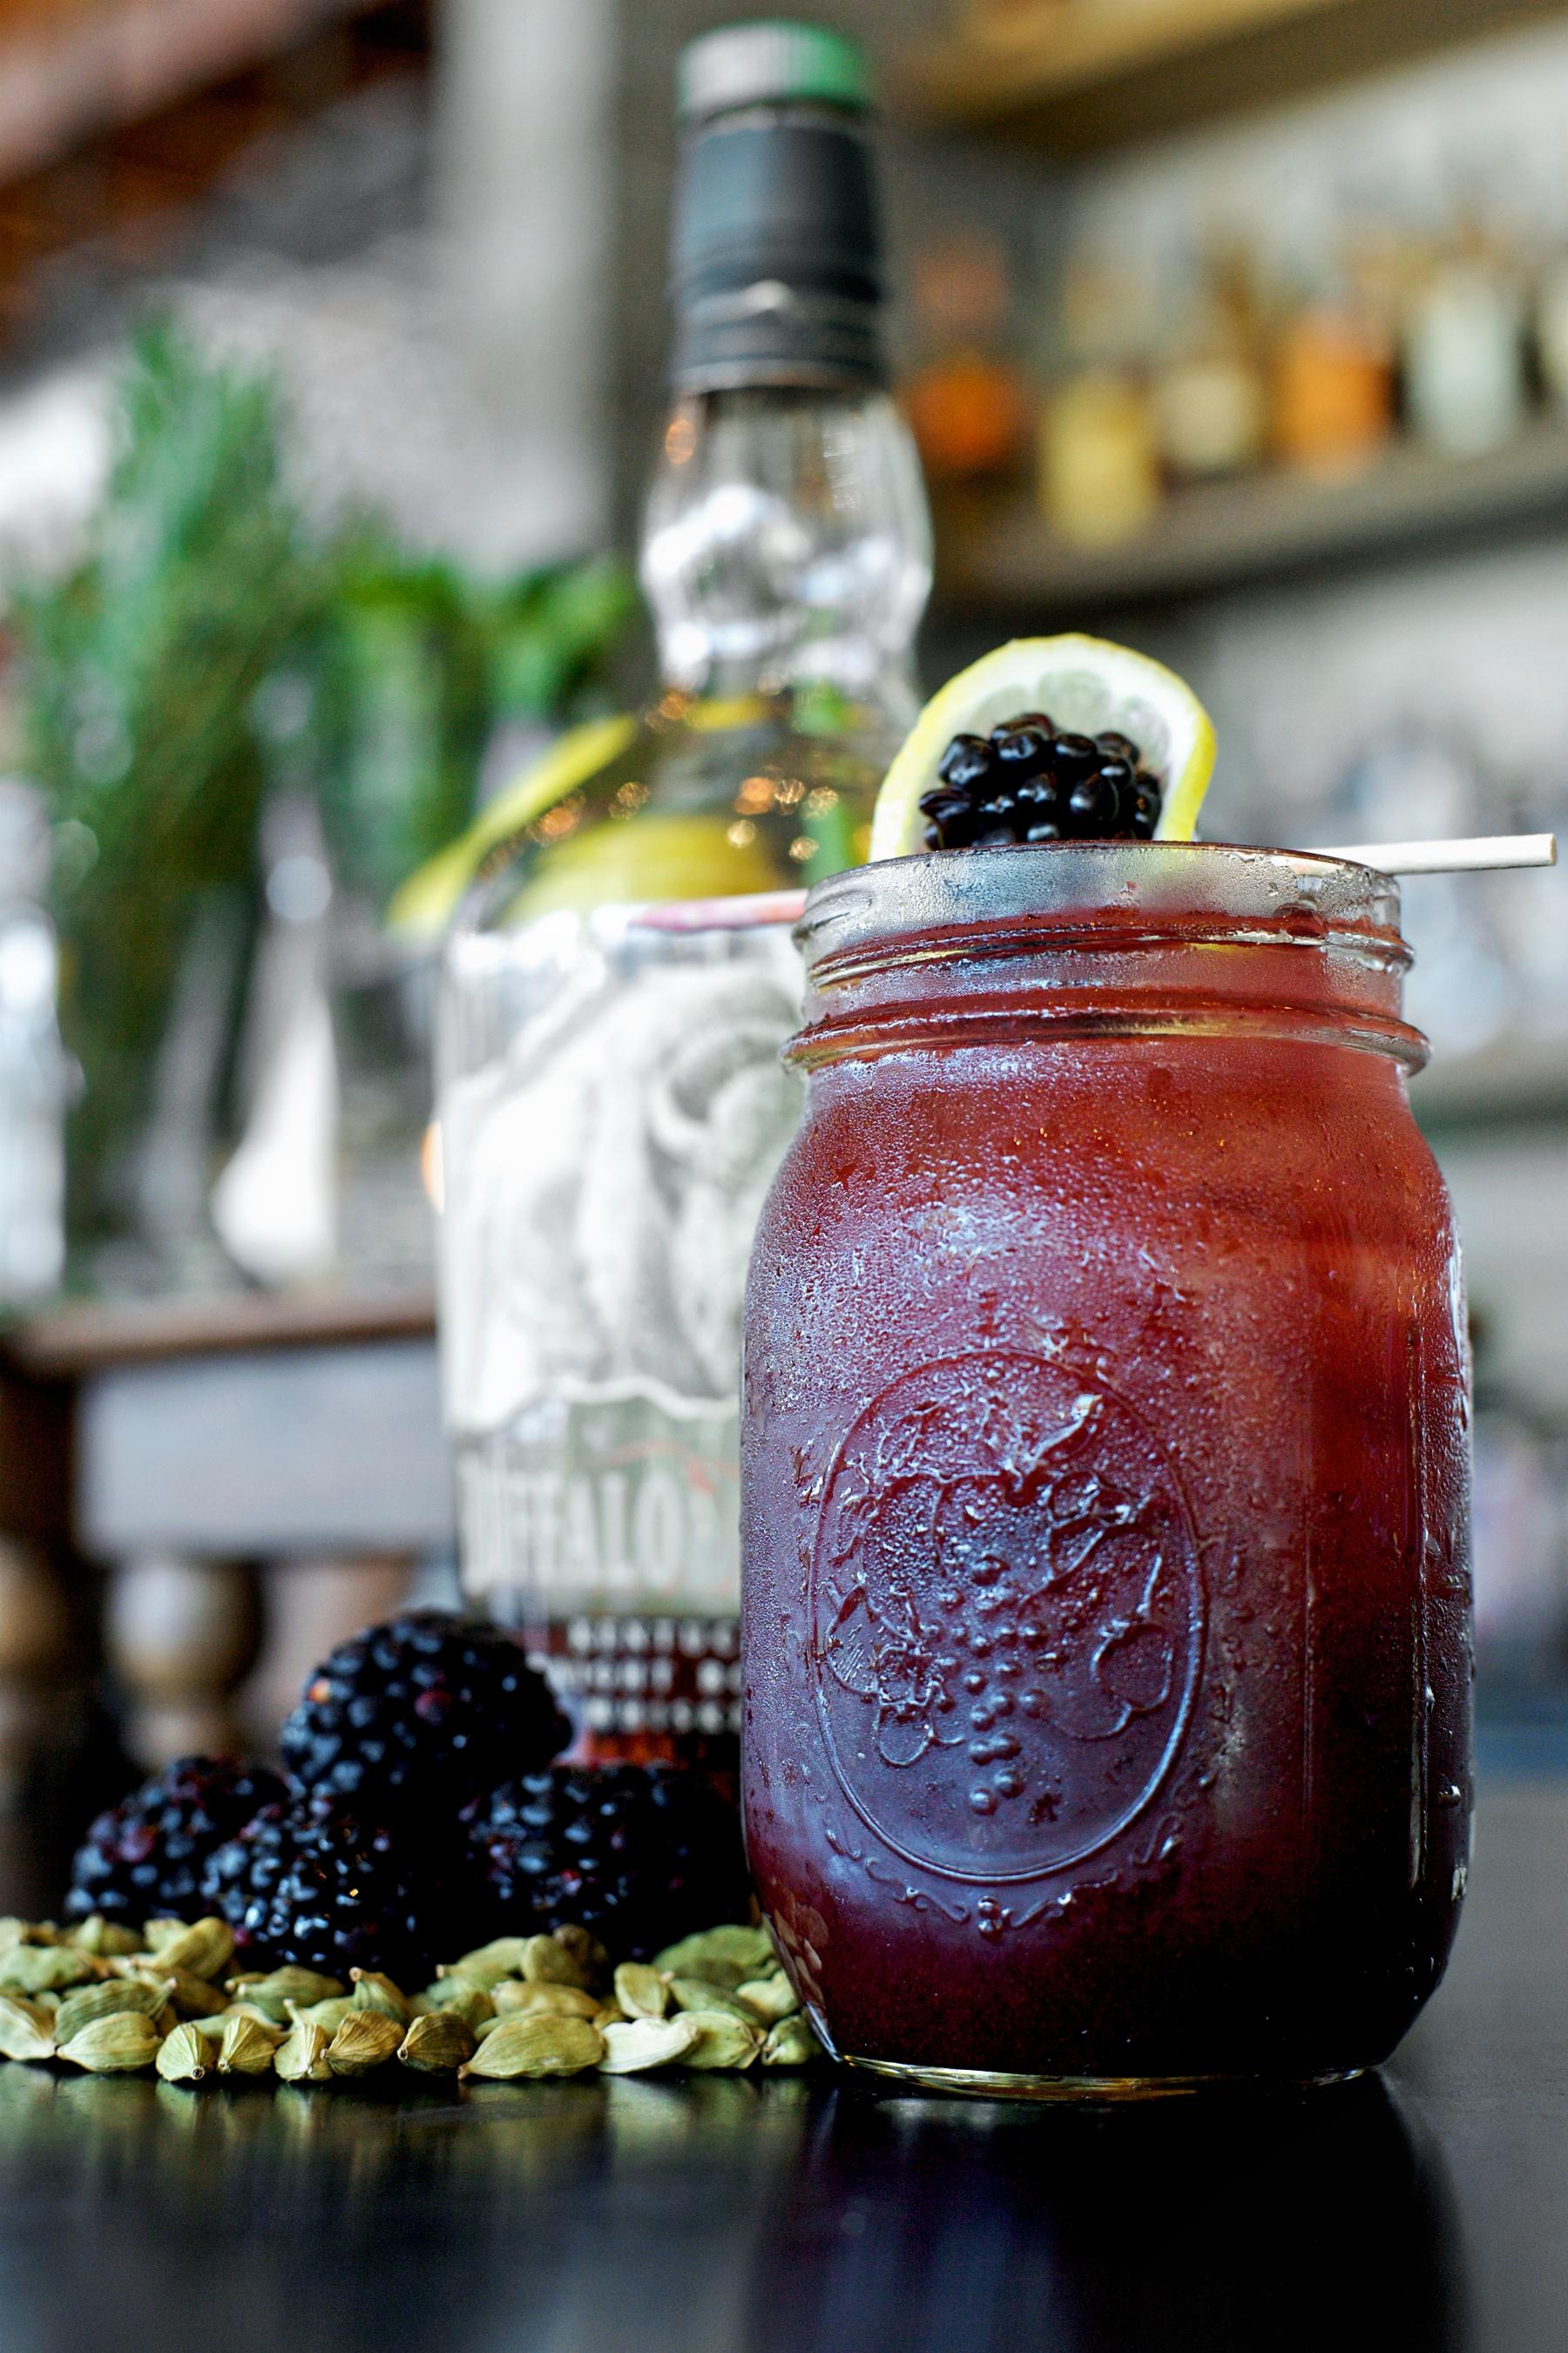 Blackberry Bourbon Lemonade at Yardbird Southern Table and Bar. Photo courtesy of Yardbird.